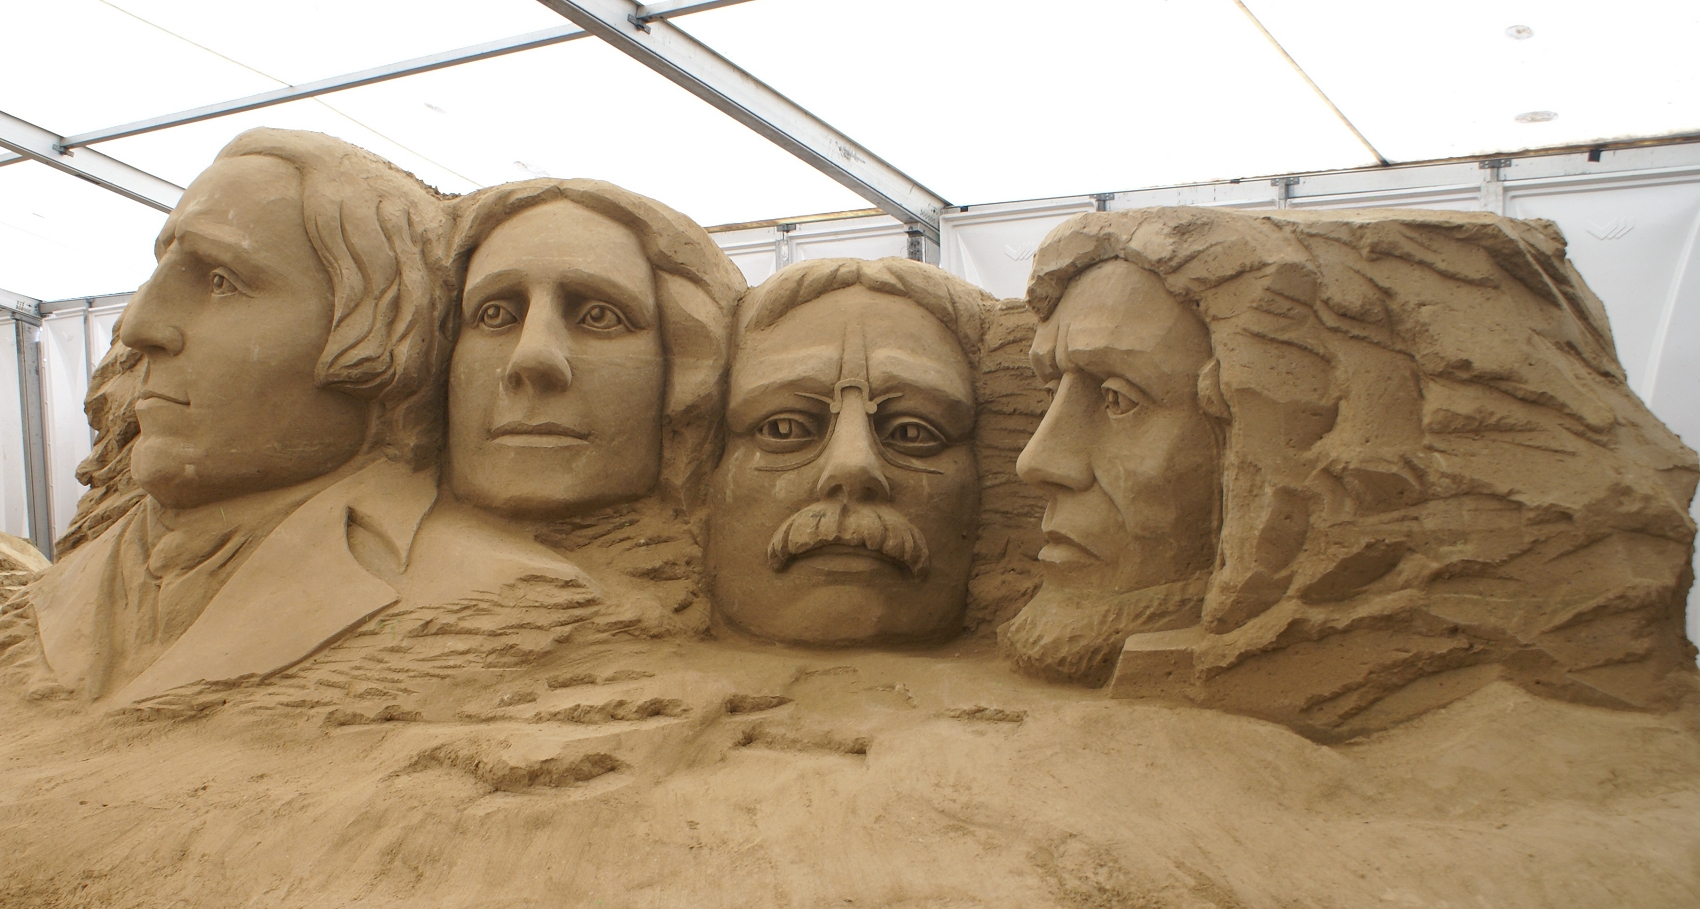 Motiv in Sand